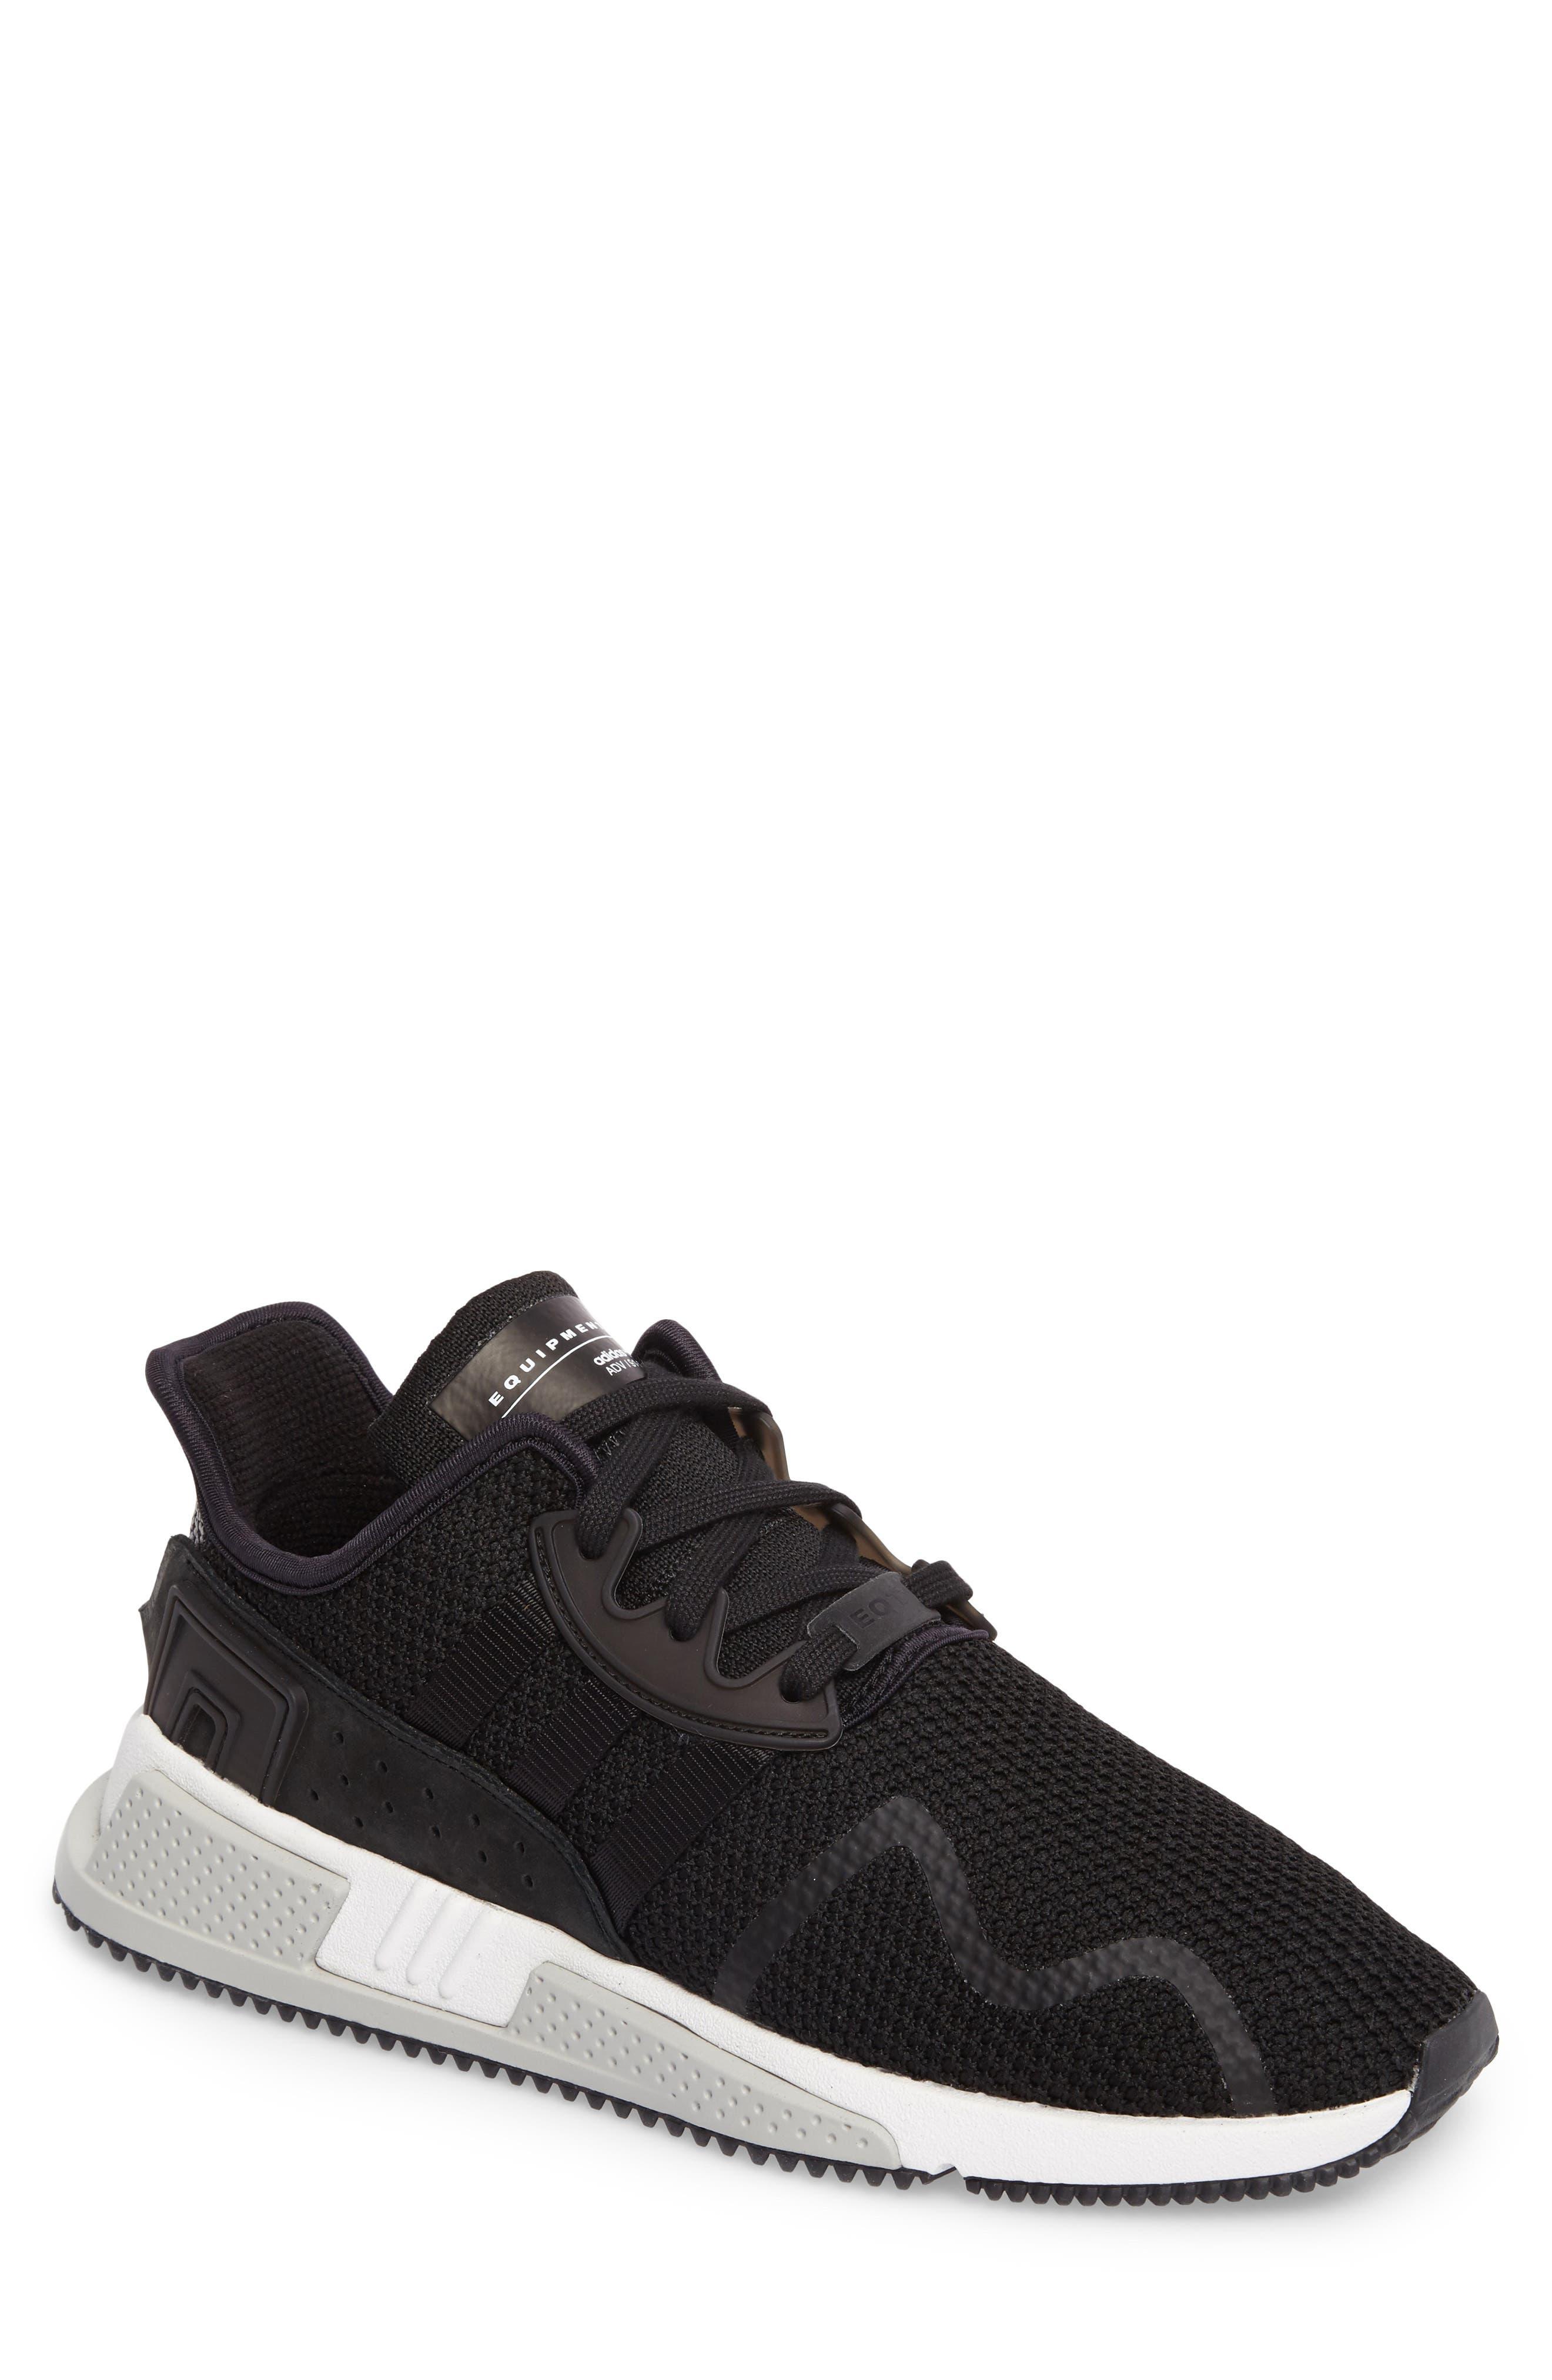 EQT Cushion ADV Sneaker,                         Main,                         color, 001